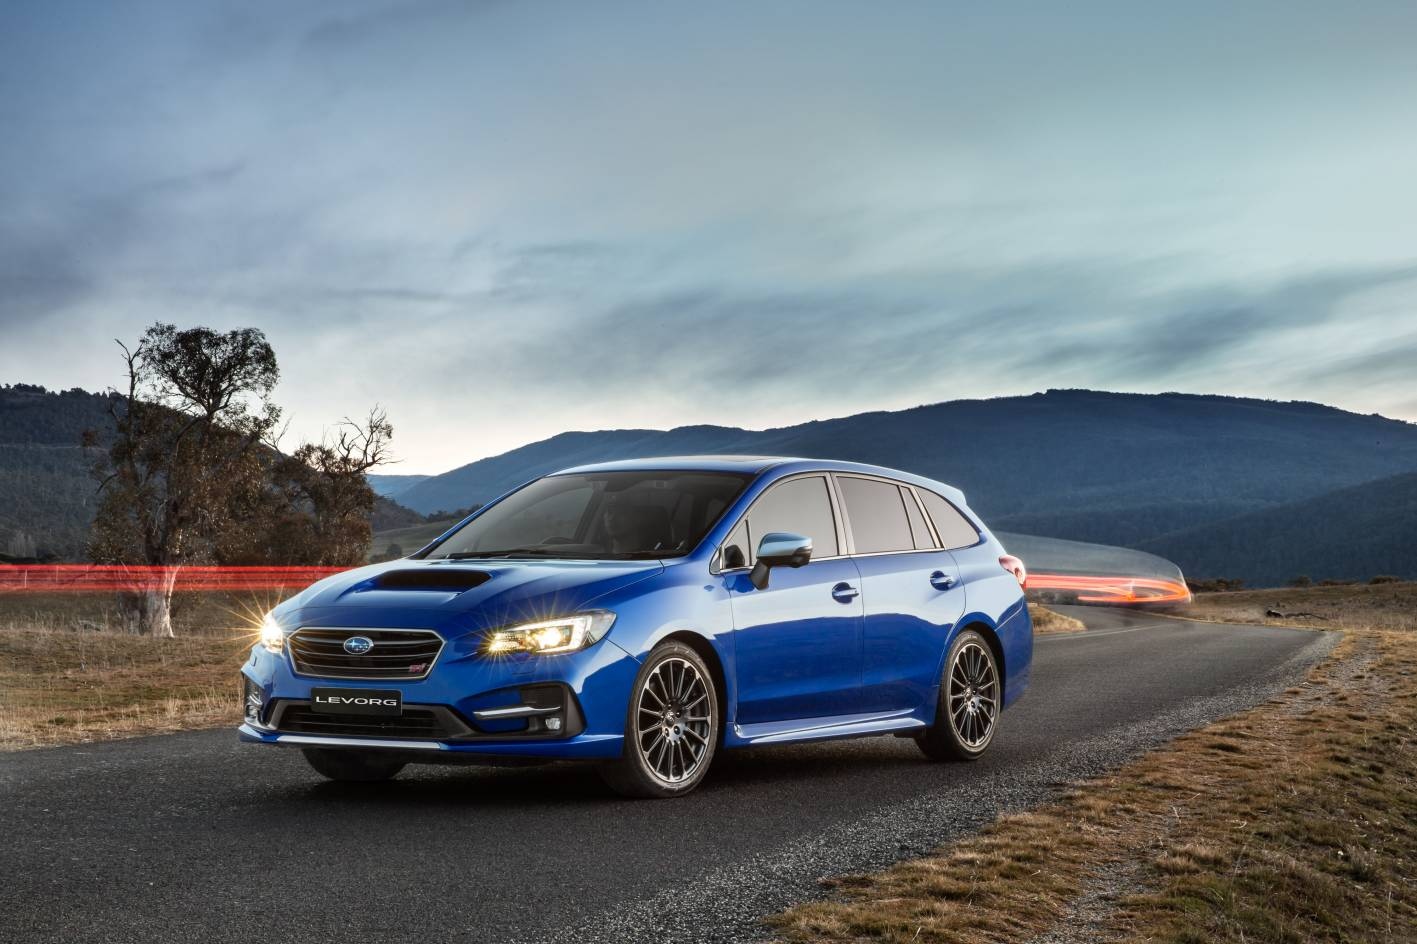 Subaru Boxer Engine >> Subaru Levorg 1.6L Turbo added as new range-opener - ForceGT.com